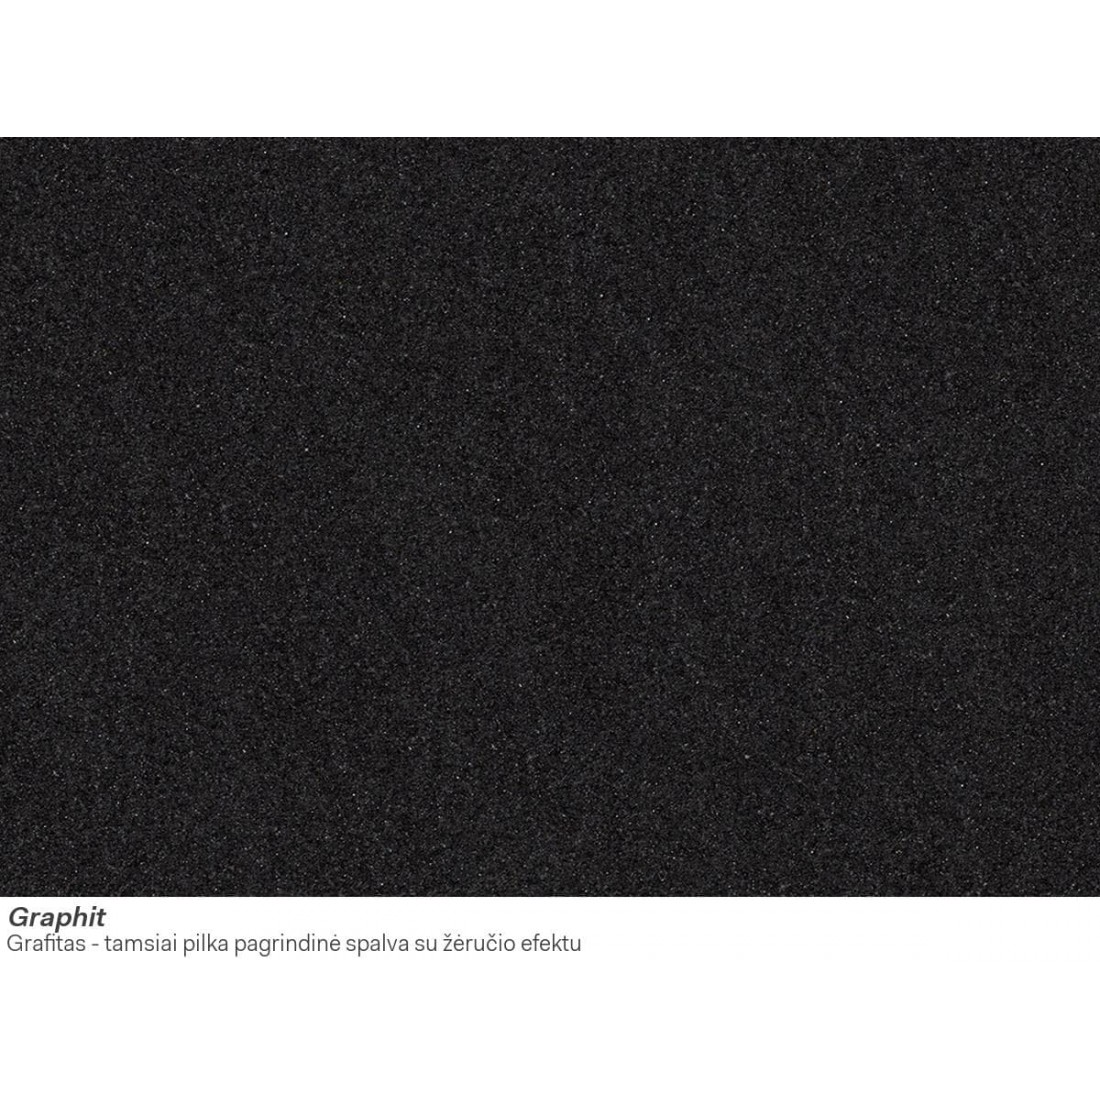 Akmens masės plautuvė Franke FX FXG 611-100, Graphit